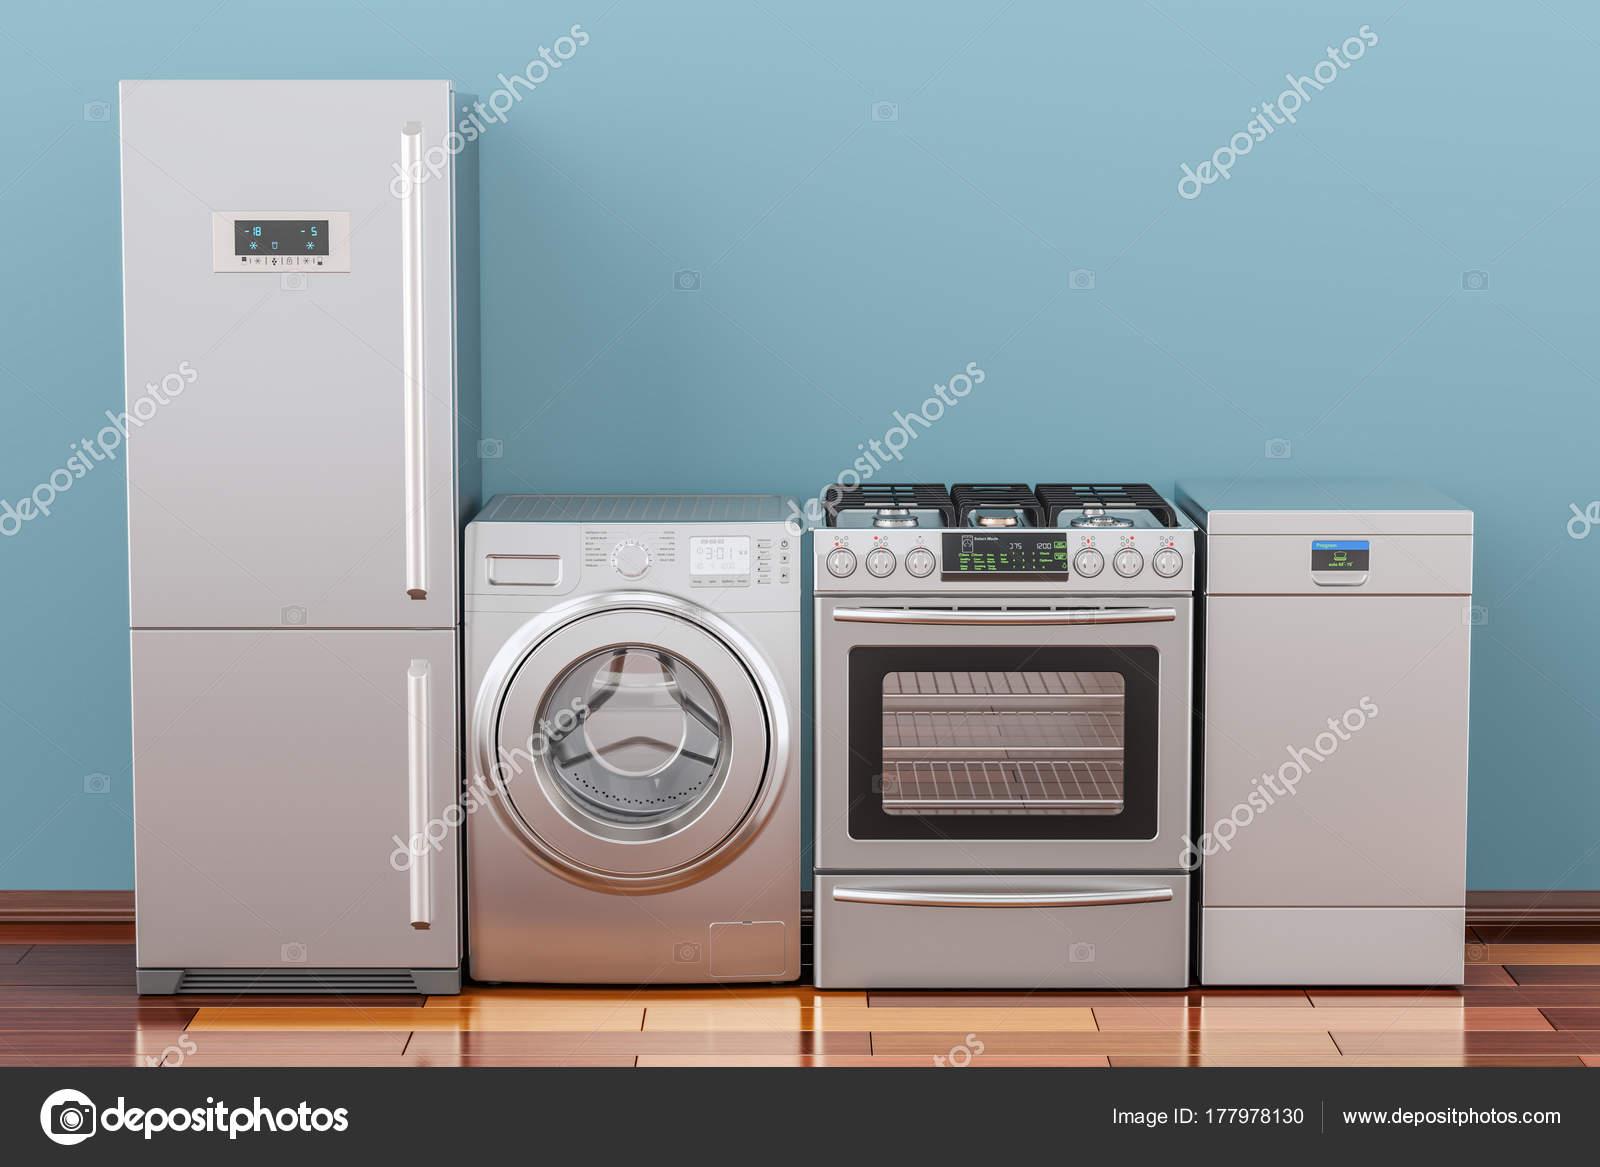 Kühlschrank Gas : Electrolux wohnmobil kühlschrank gas v v kombi in graubünden